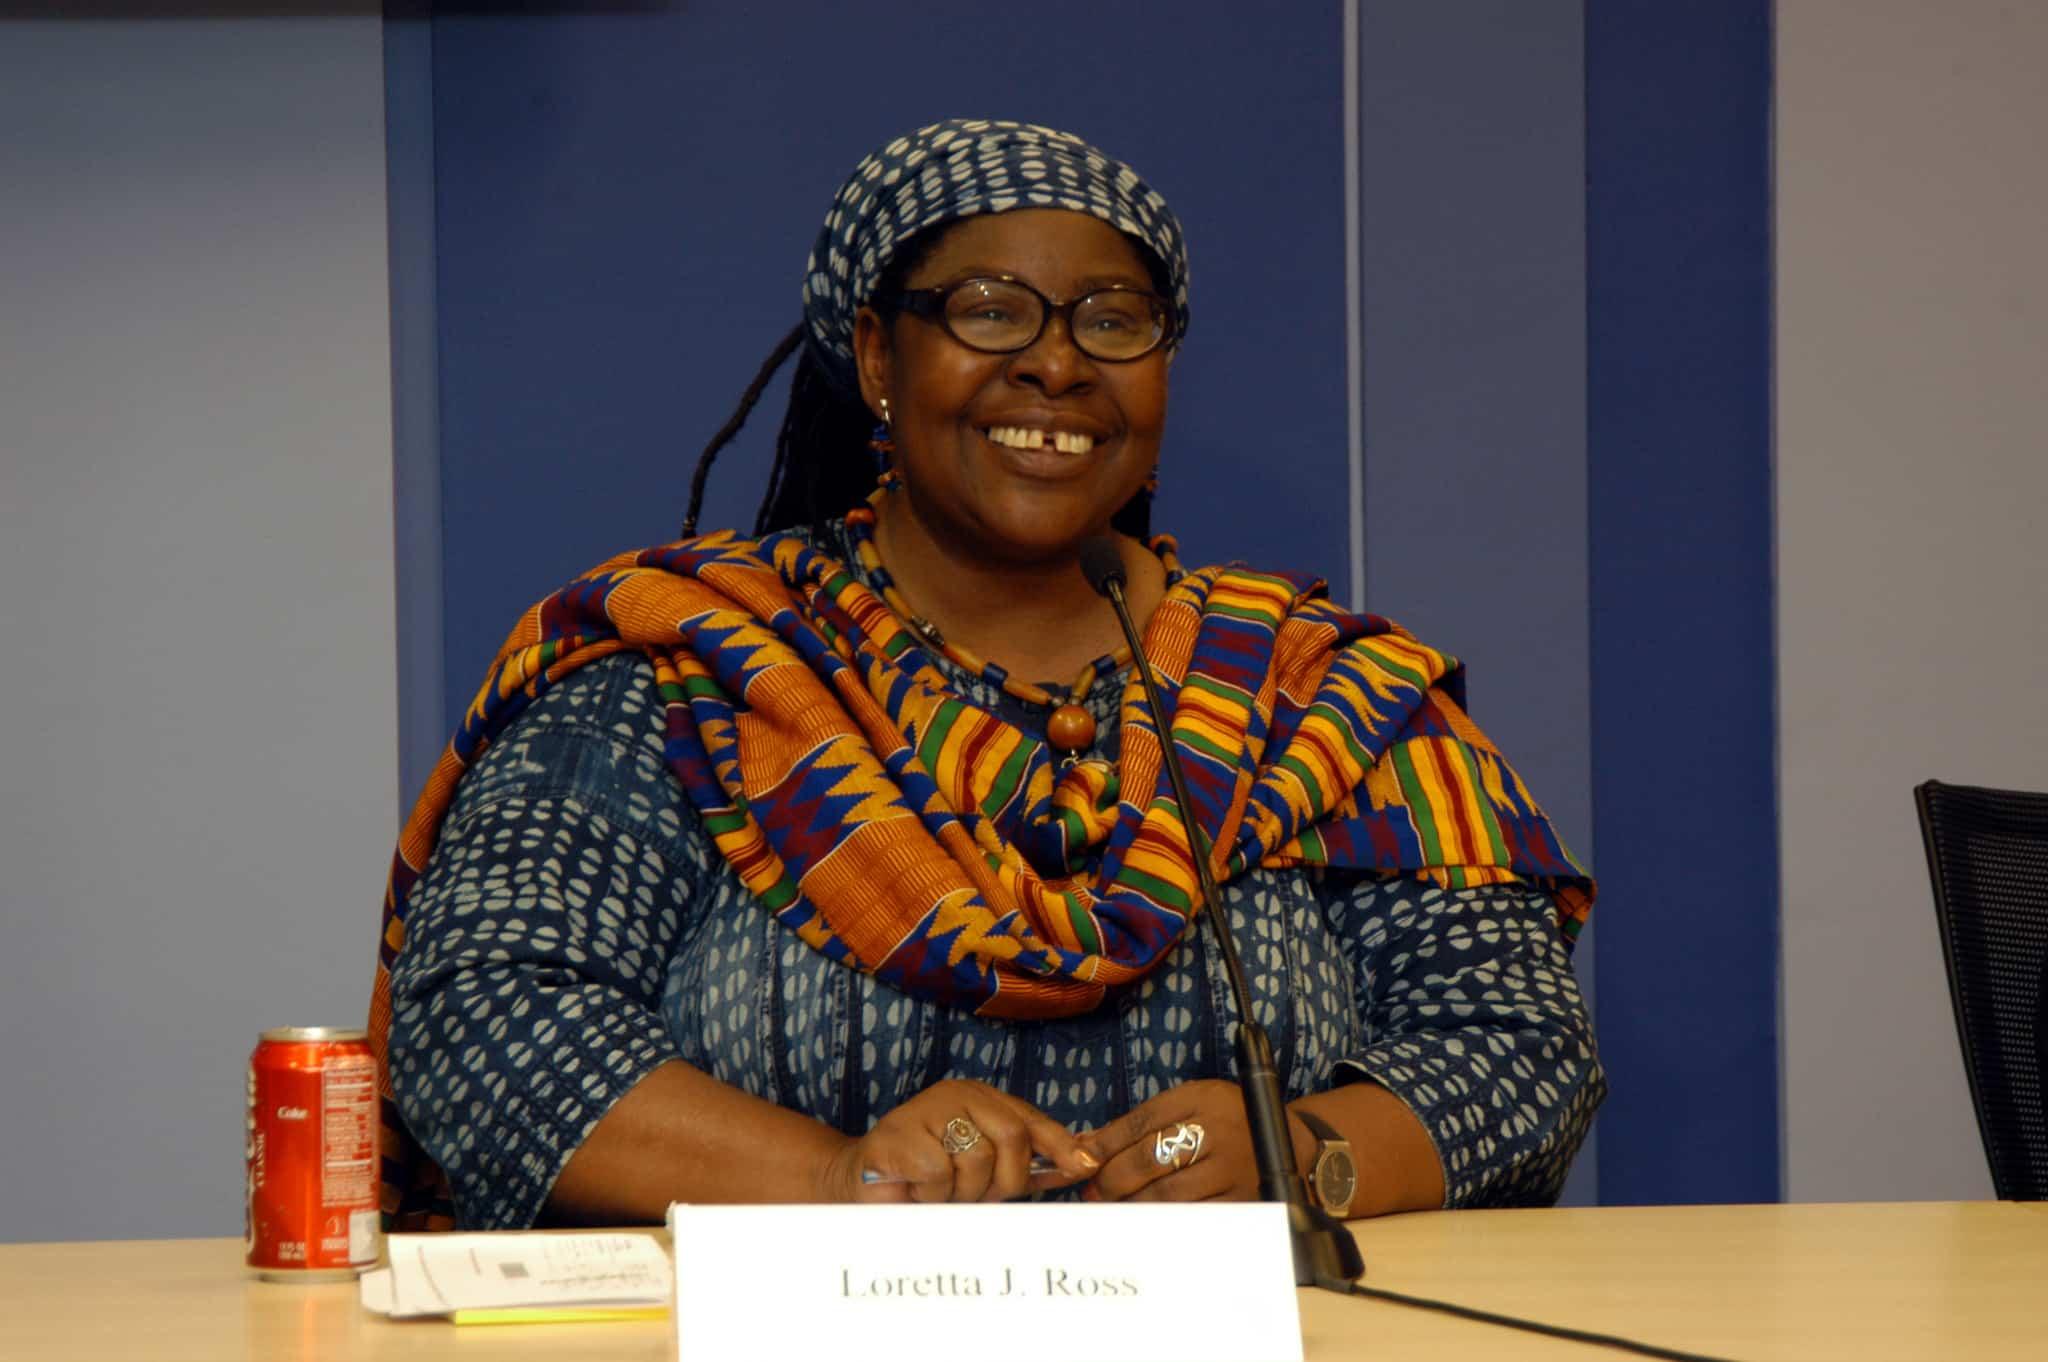 Loretta J. Ross, Feministin, Hochschullehrerin, Aktivistin und Mitgründerin von Sister Song (Bild: Center for American Progress, Flickr)